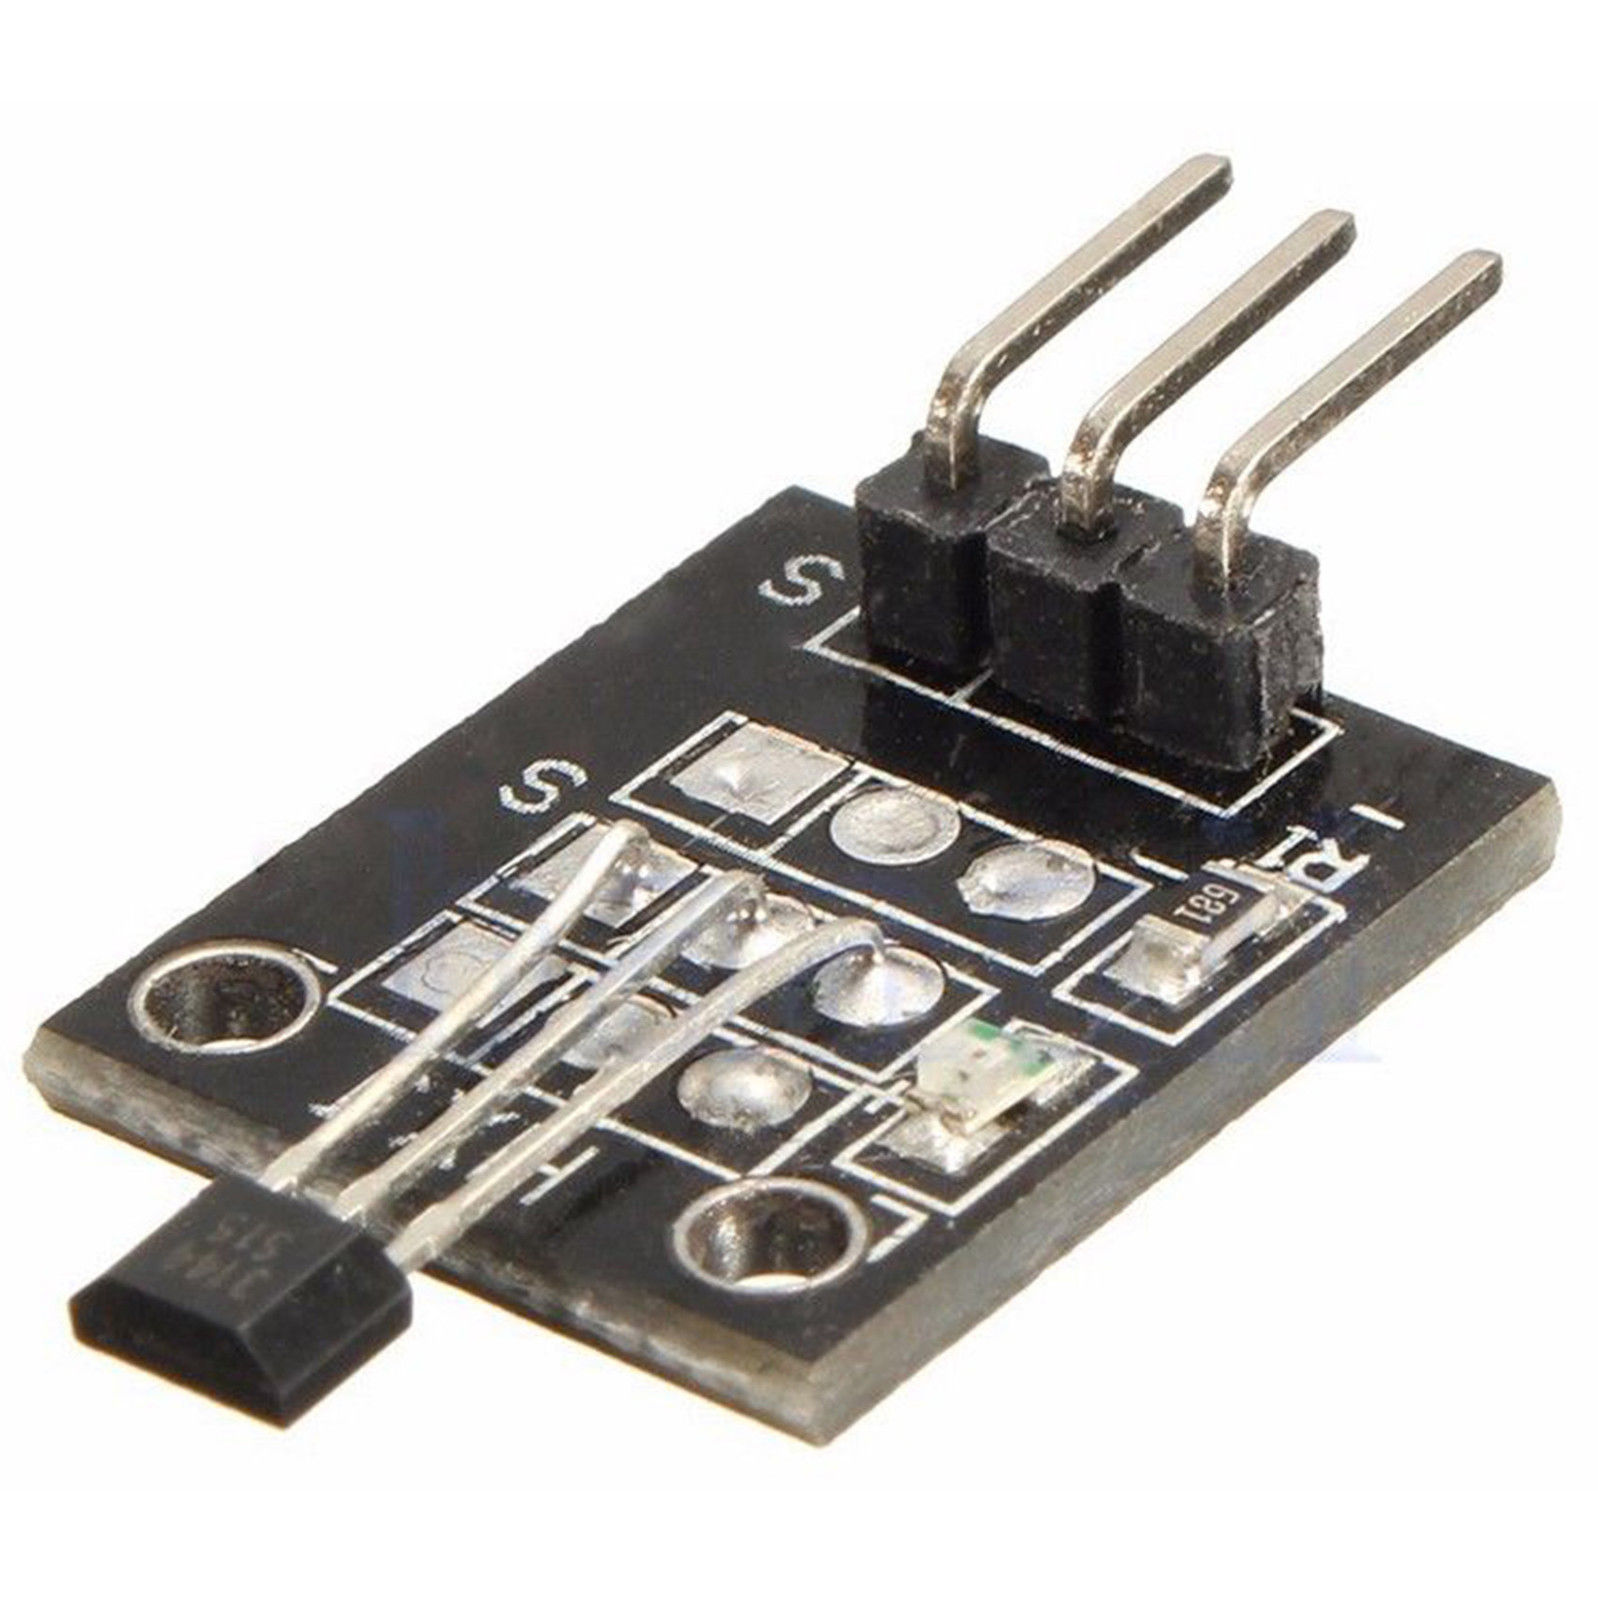 KY-003 Hall Effect Sensor Module